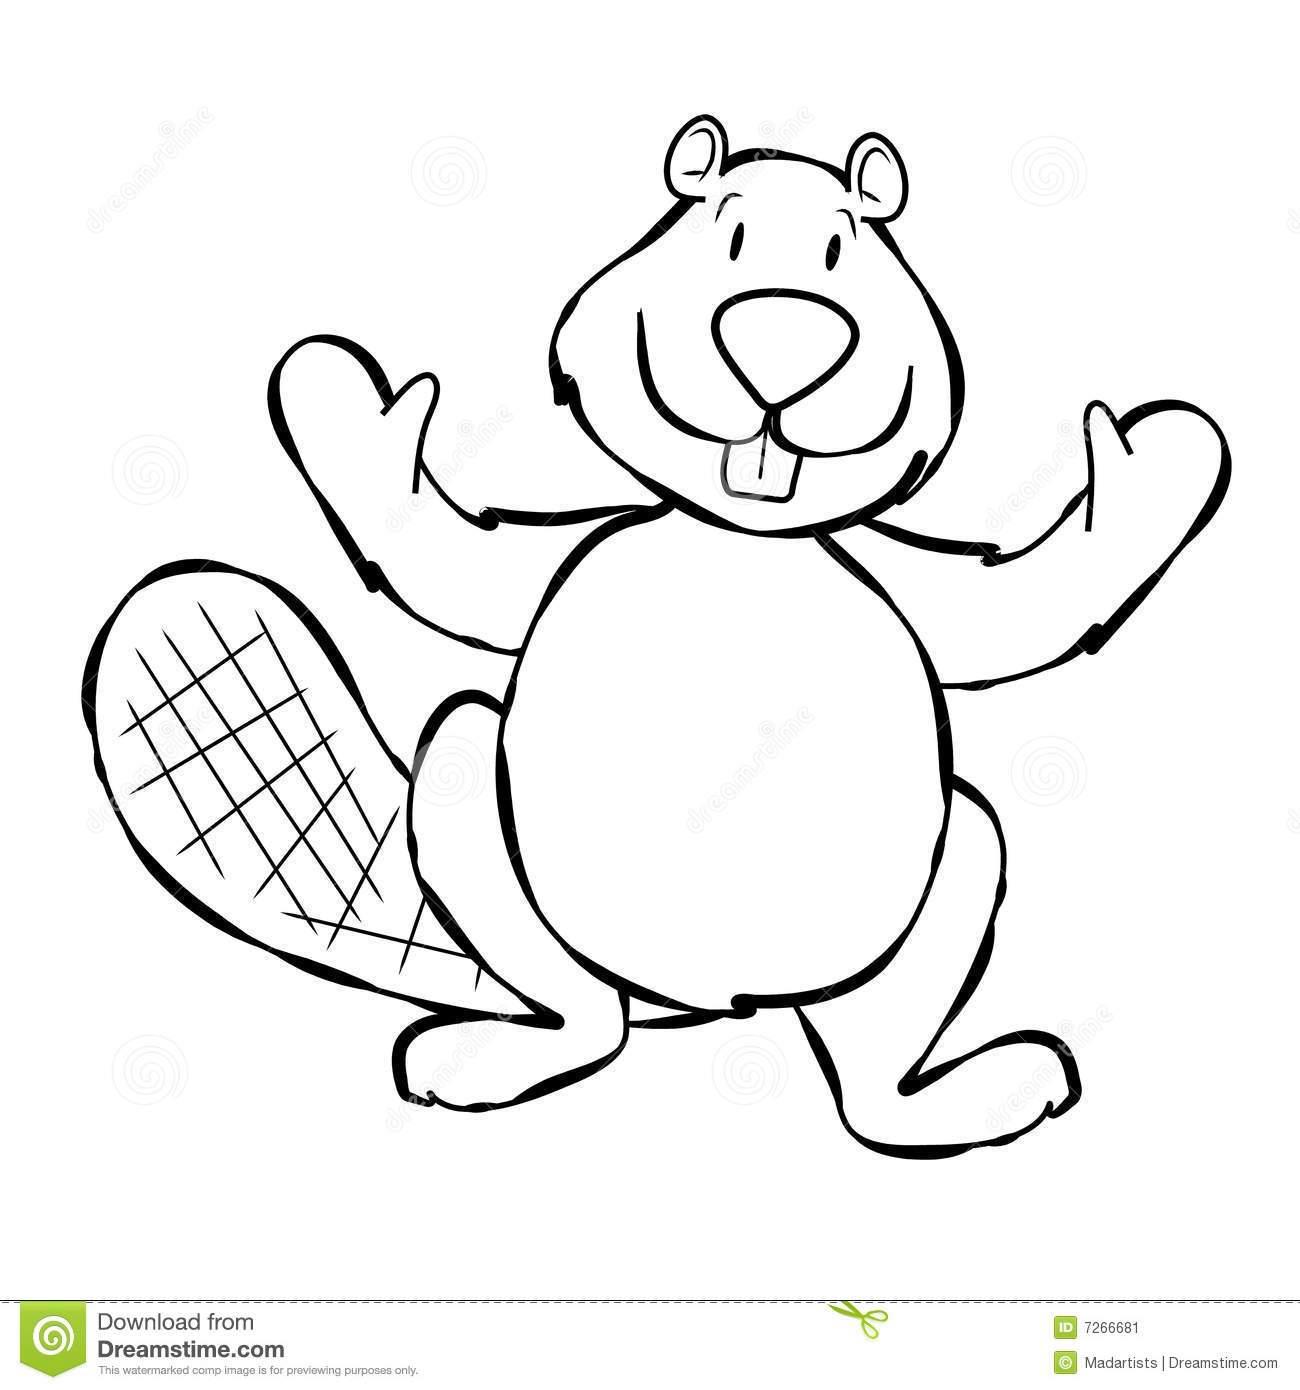 Beaver black and white clipart